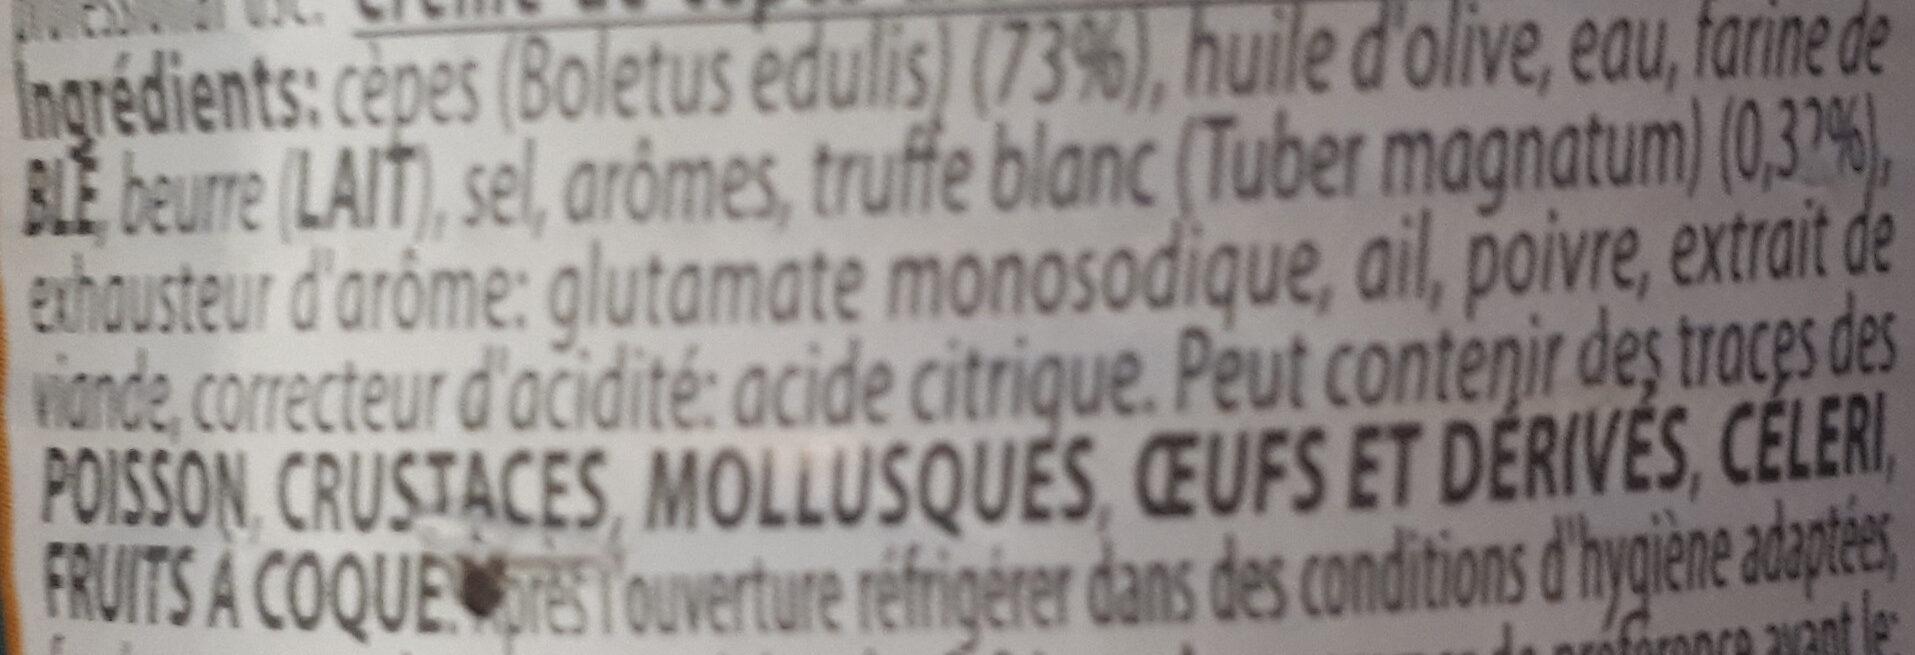 Crème de cèpes arômatisée à la truffe blanche - Ingrediënten - fr